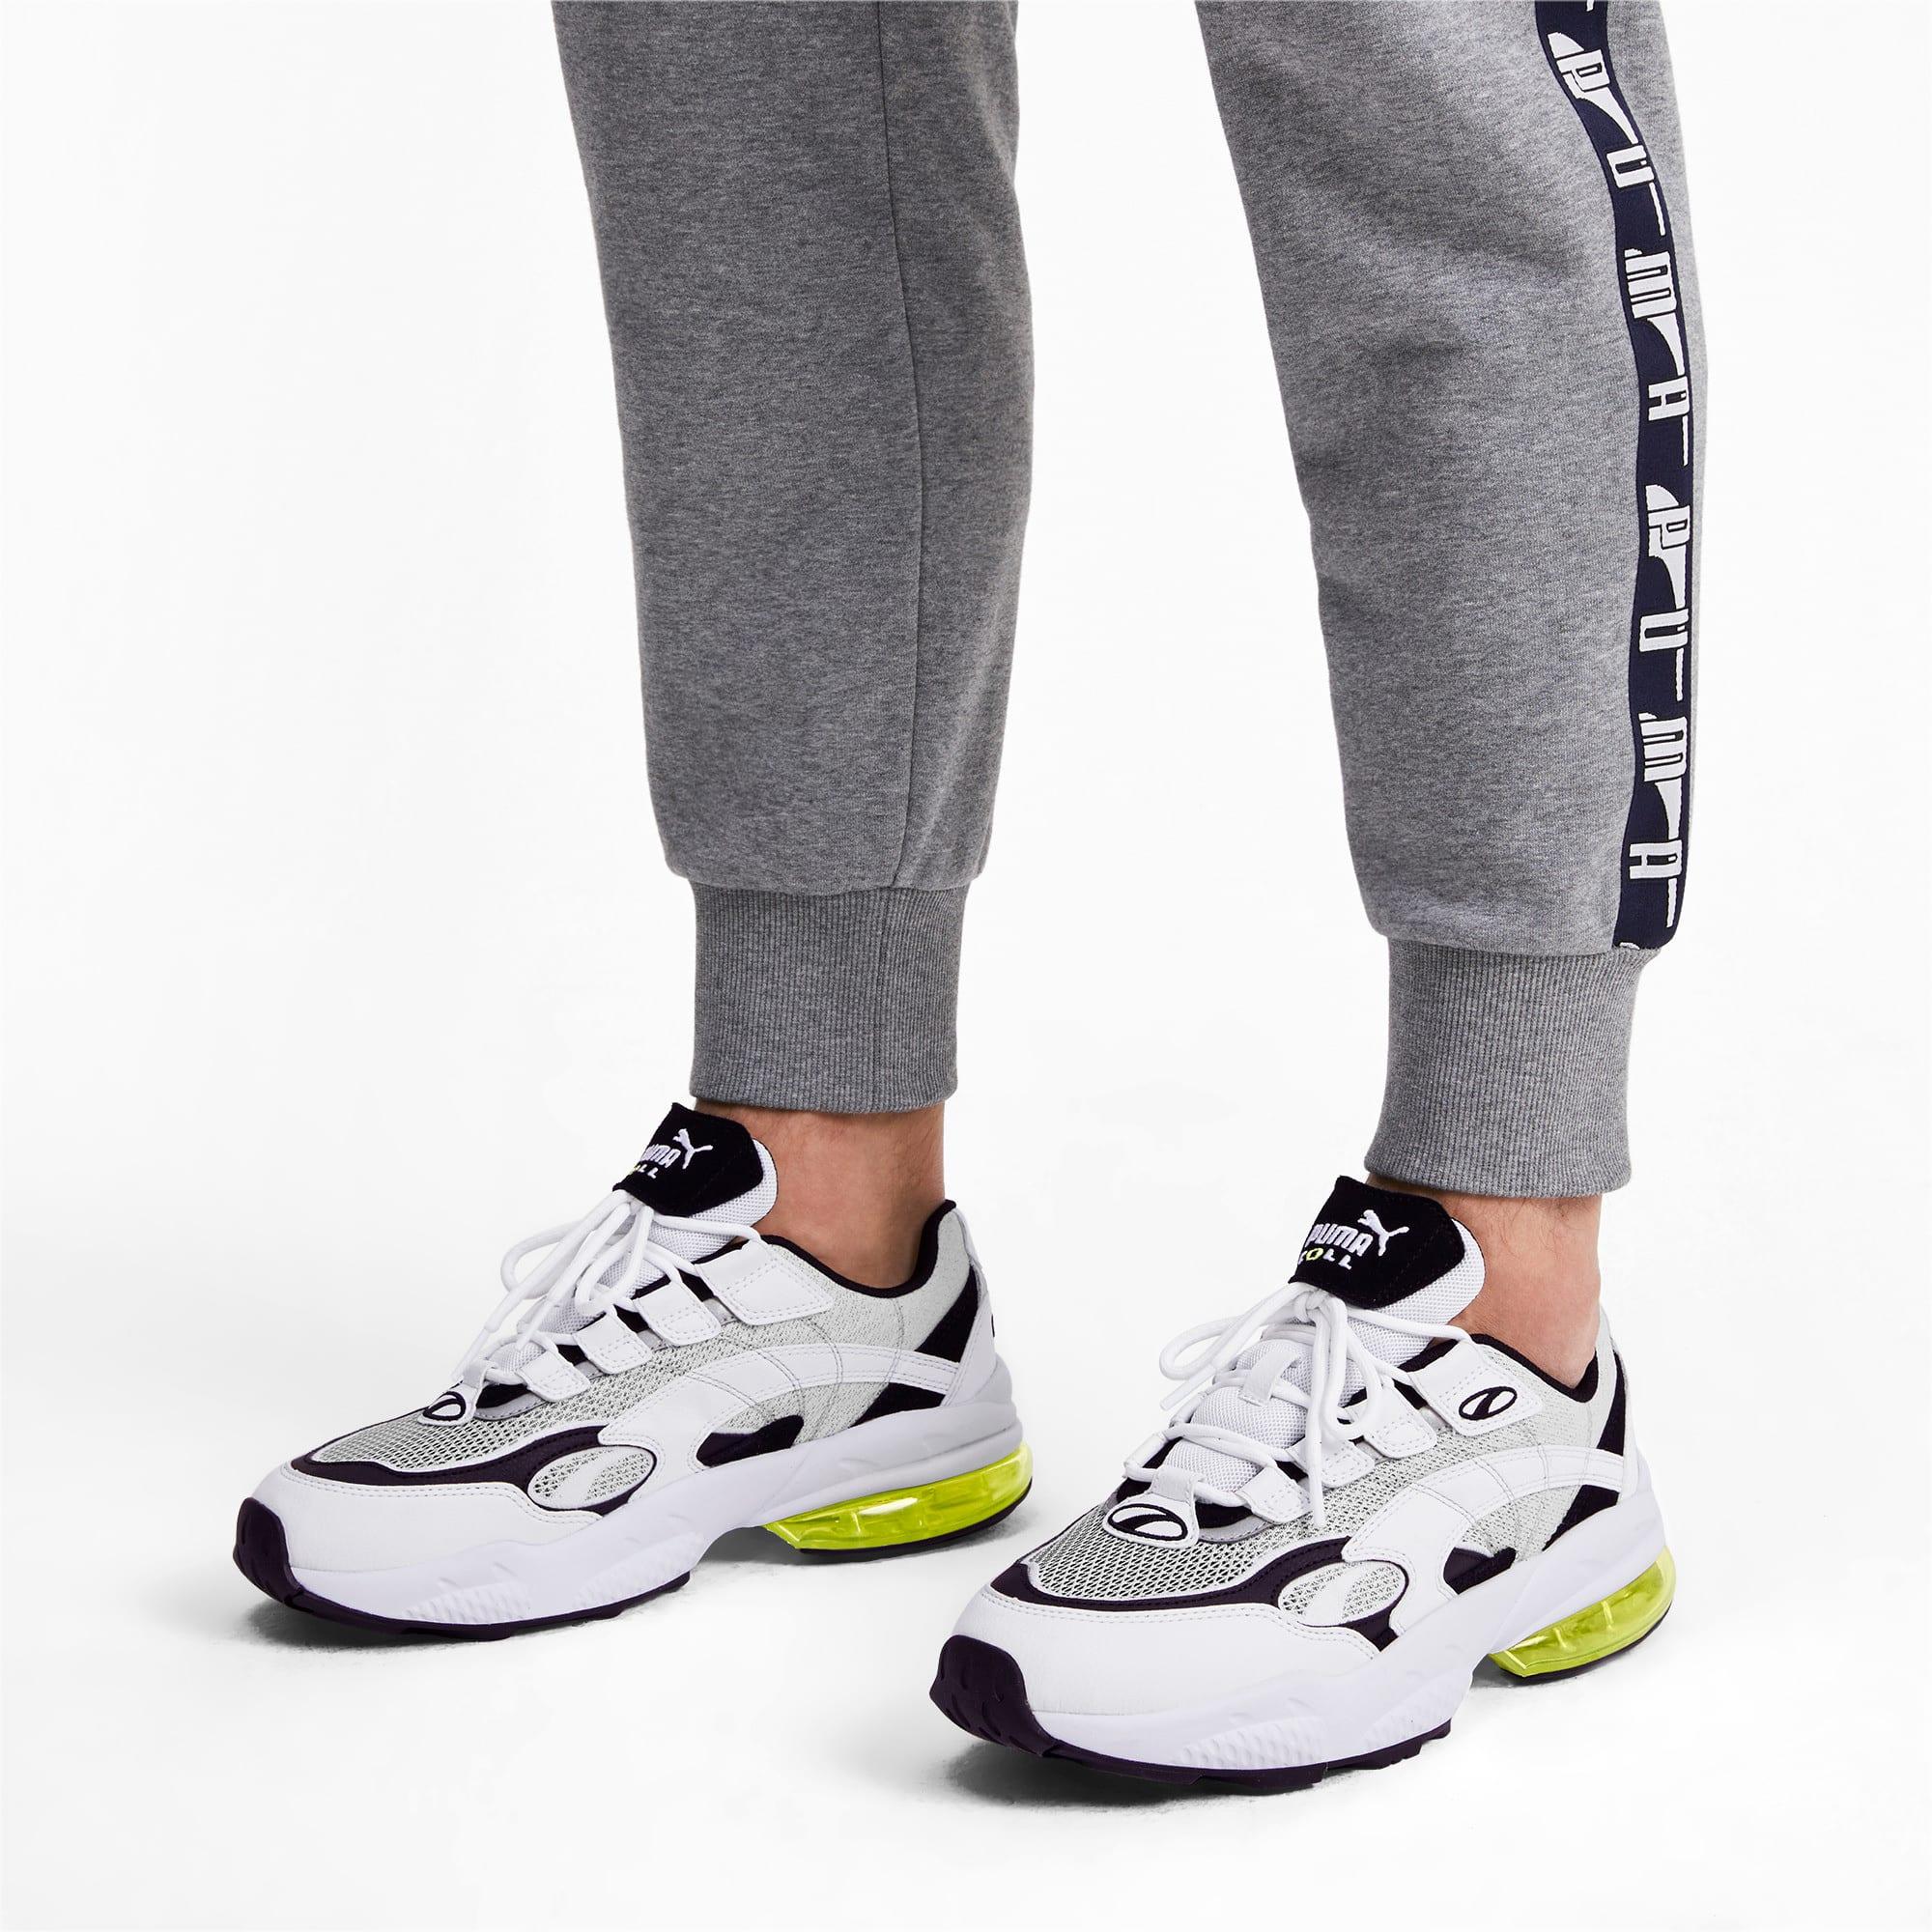 Thumbnail 2 of CELL Venom Alert Sneakers, Puma White-Puma Black, medium